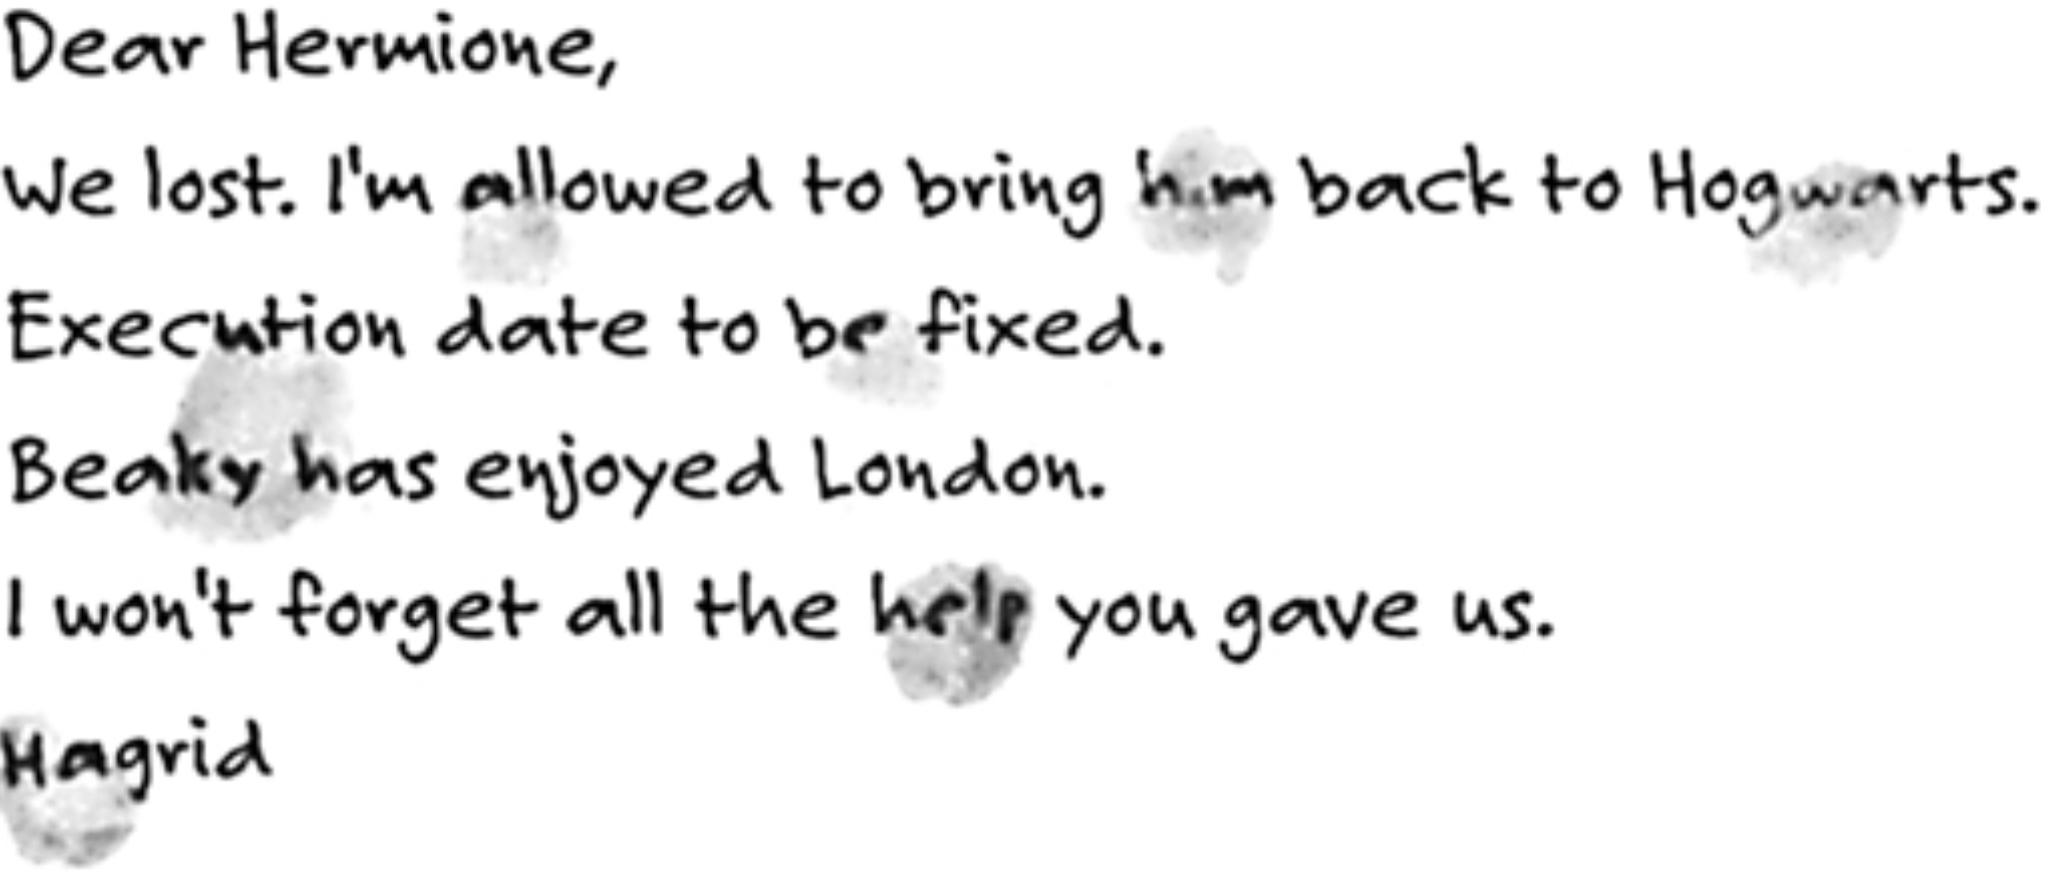 Rubeus Hagrid's letter to Hermione Granger